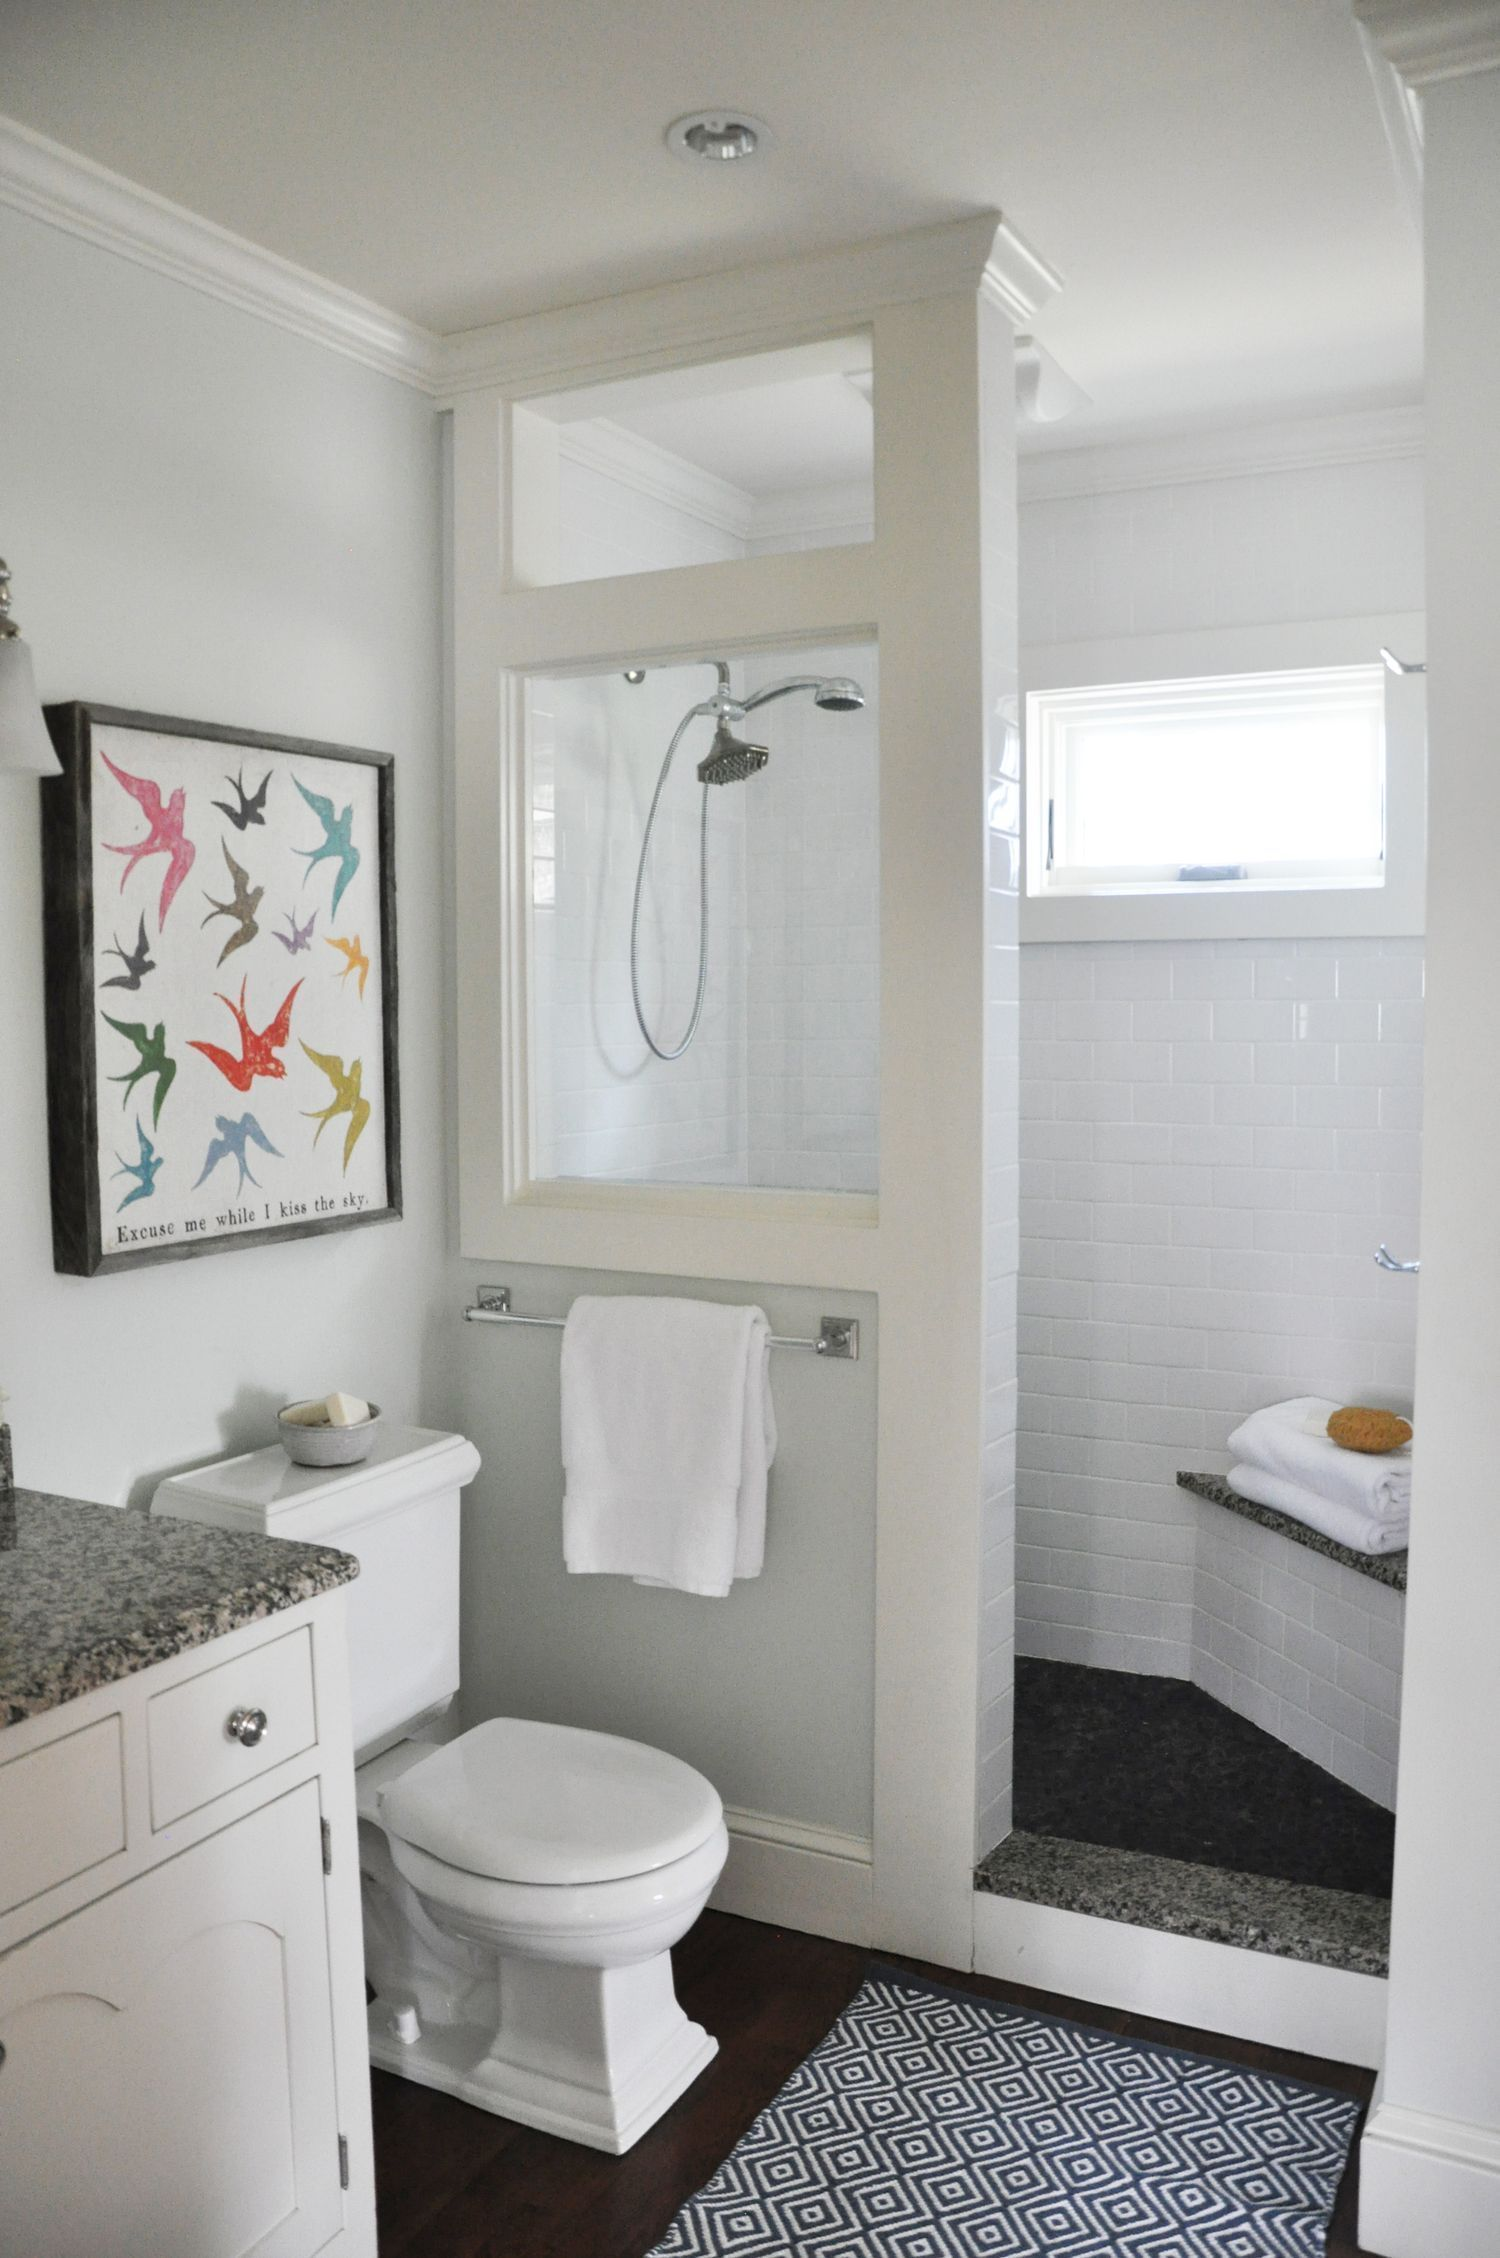 9 awesome basement bathroom ideas on budget  tags